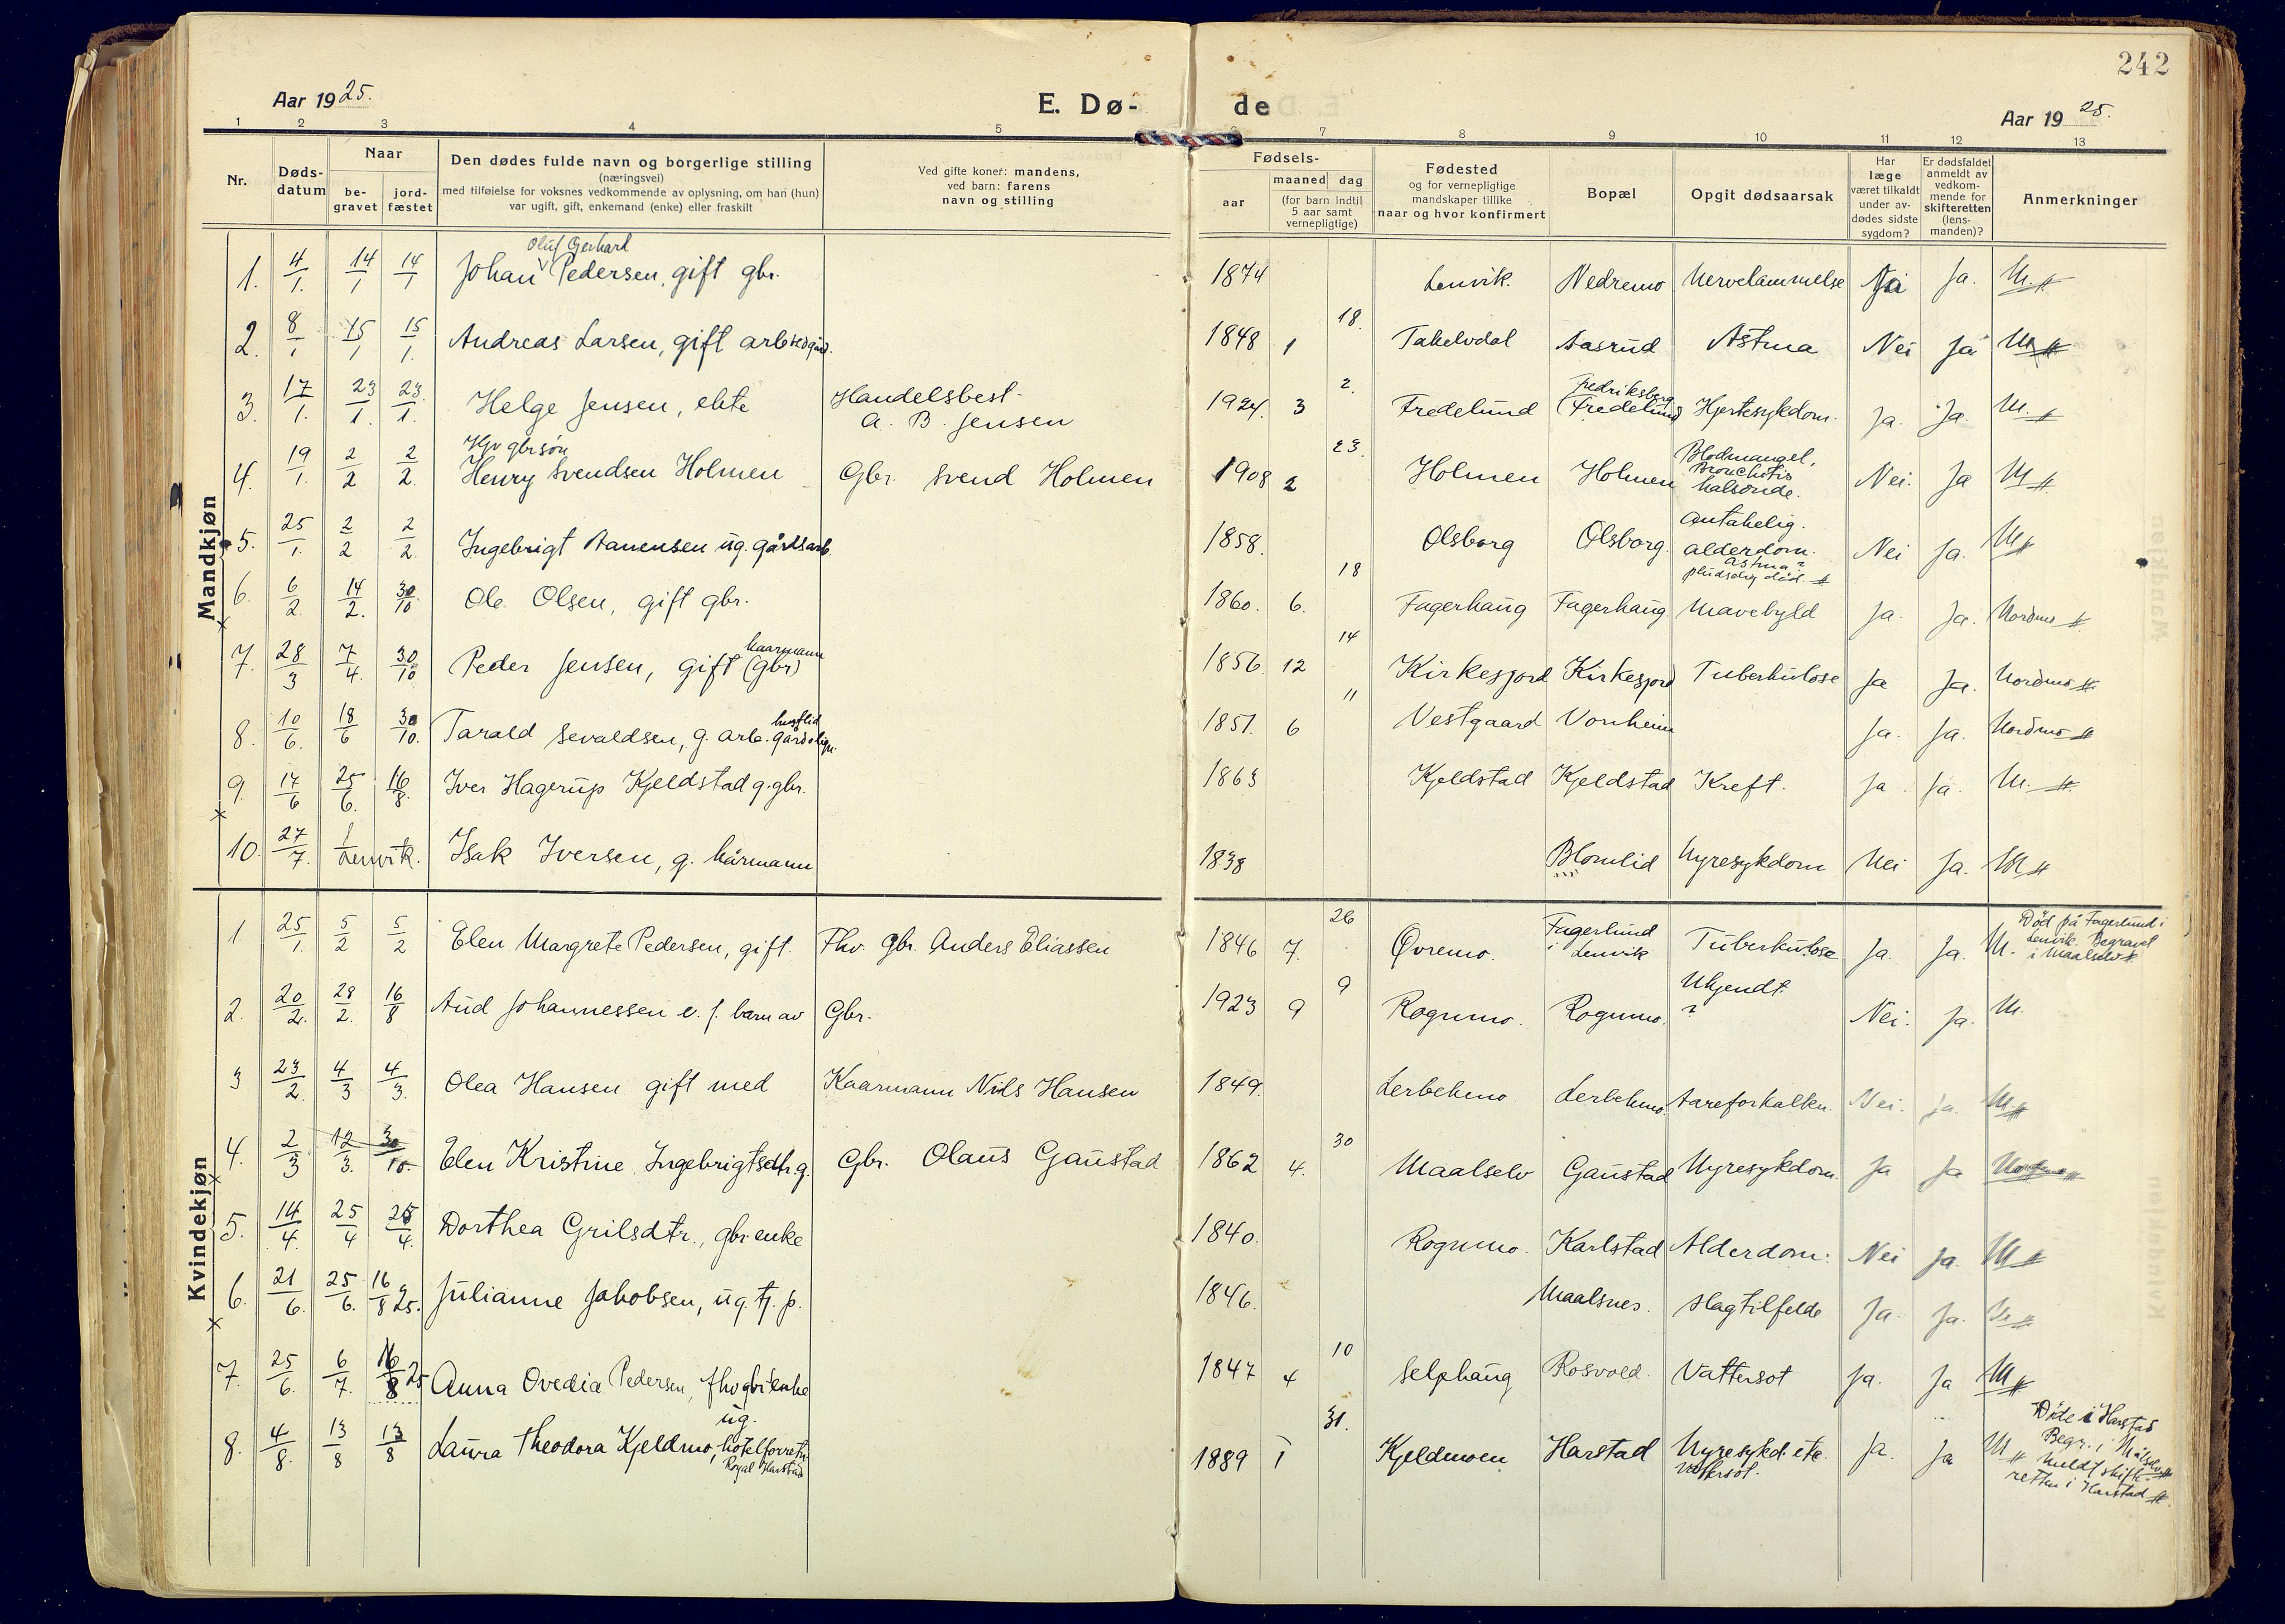 SATØ, Målselv sokneprestembete, Ministerialbok nr. 14, 1919-1932, s. 242